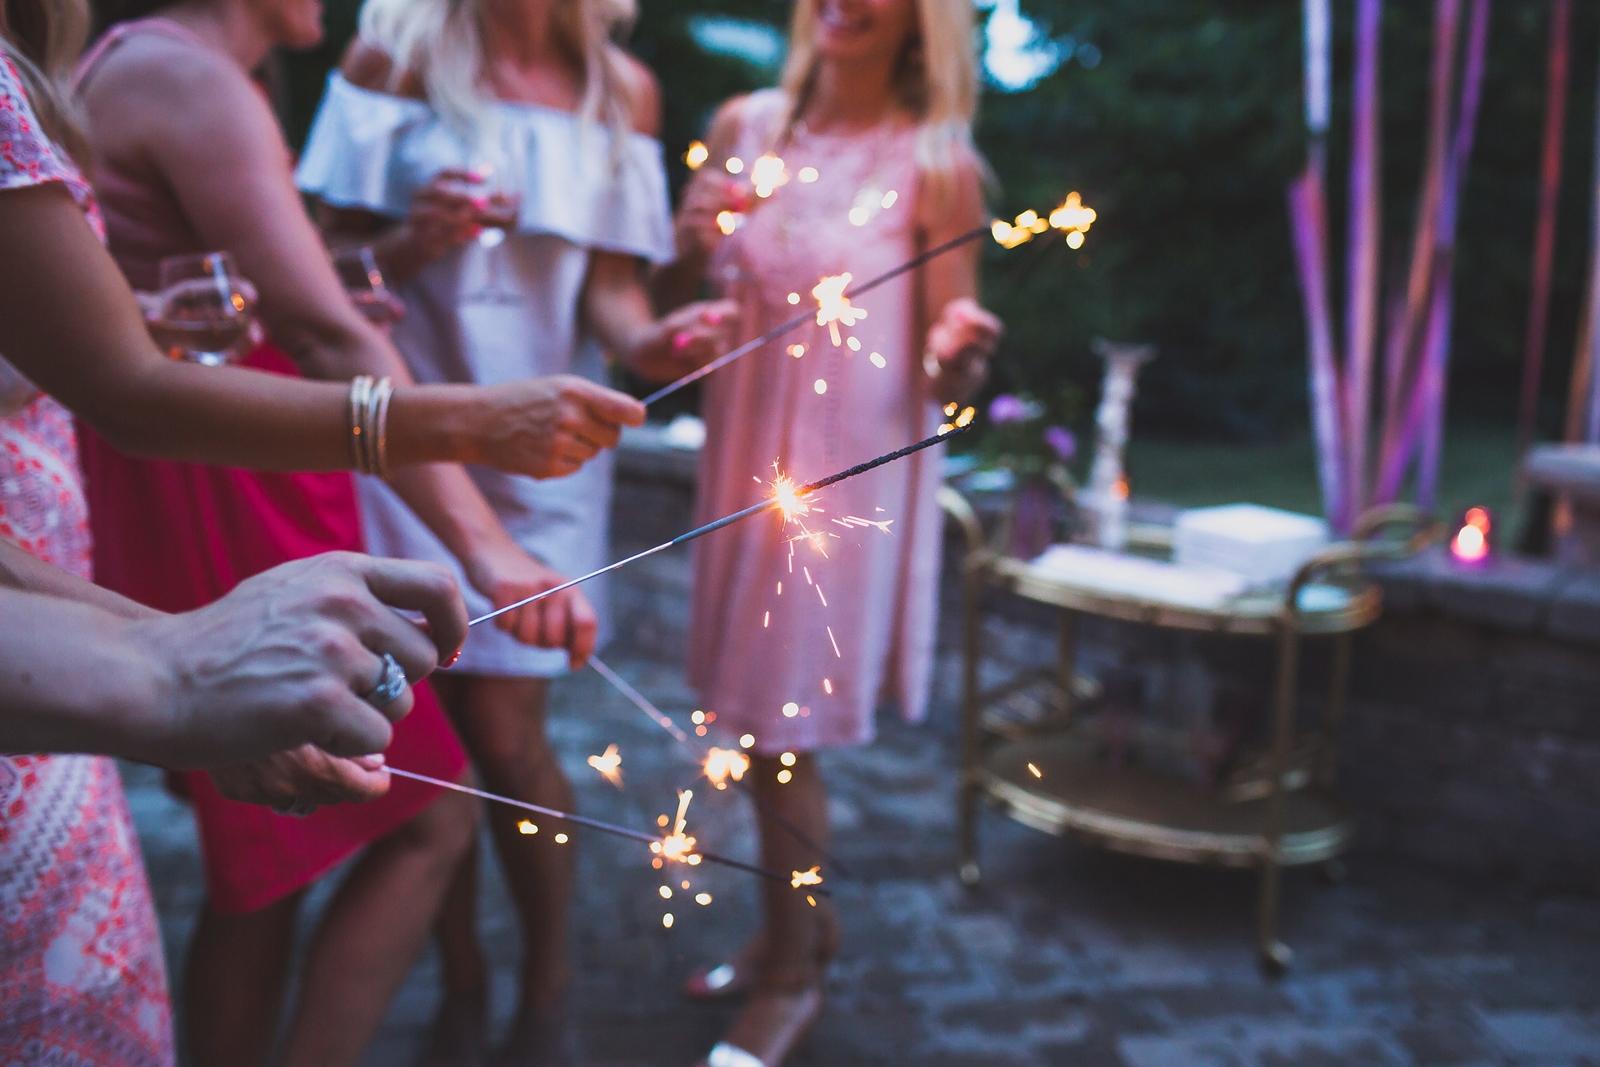 wine-tasting-one-stylish-party-99